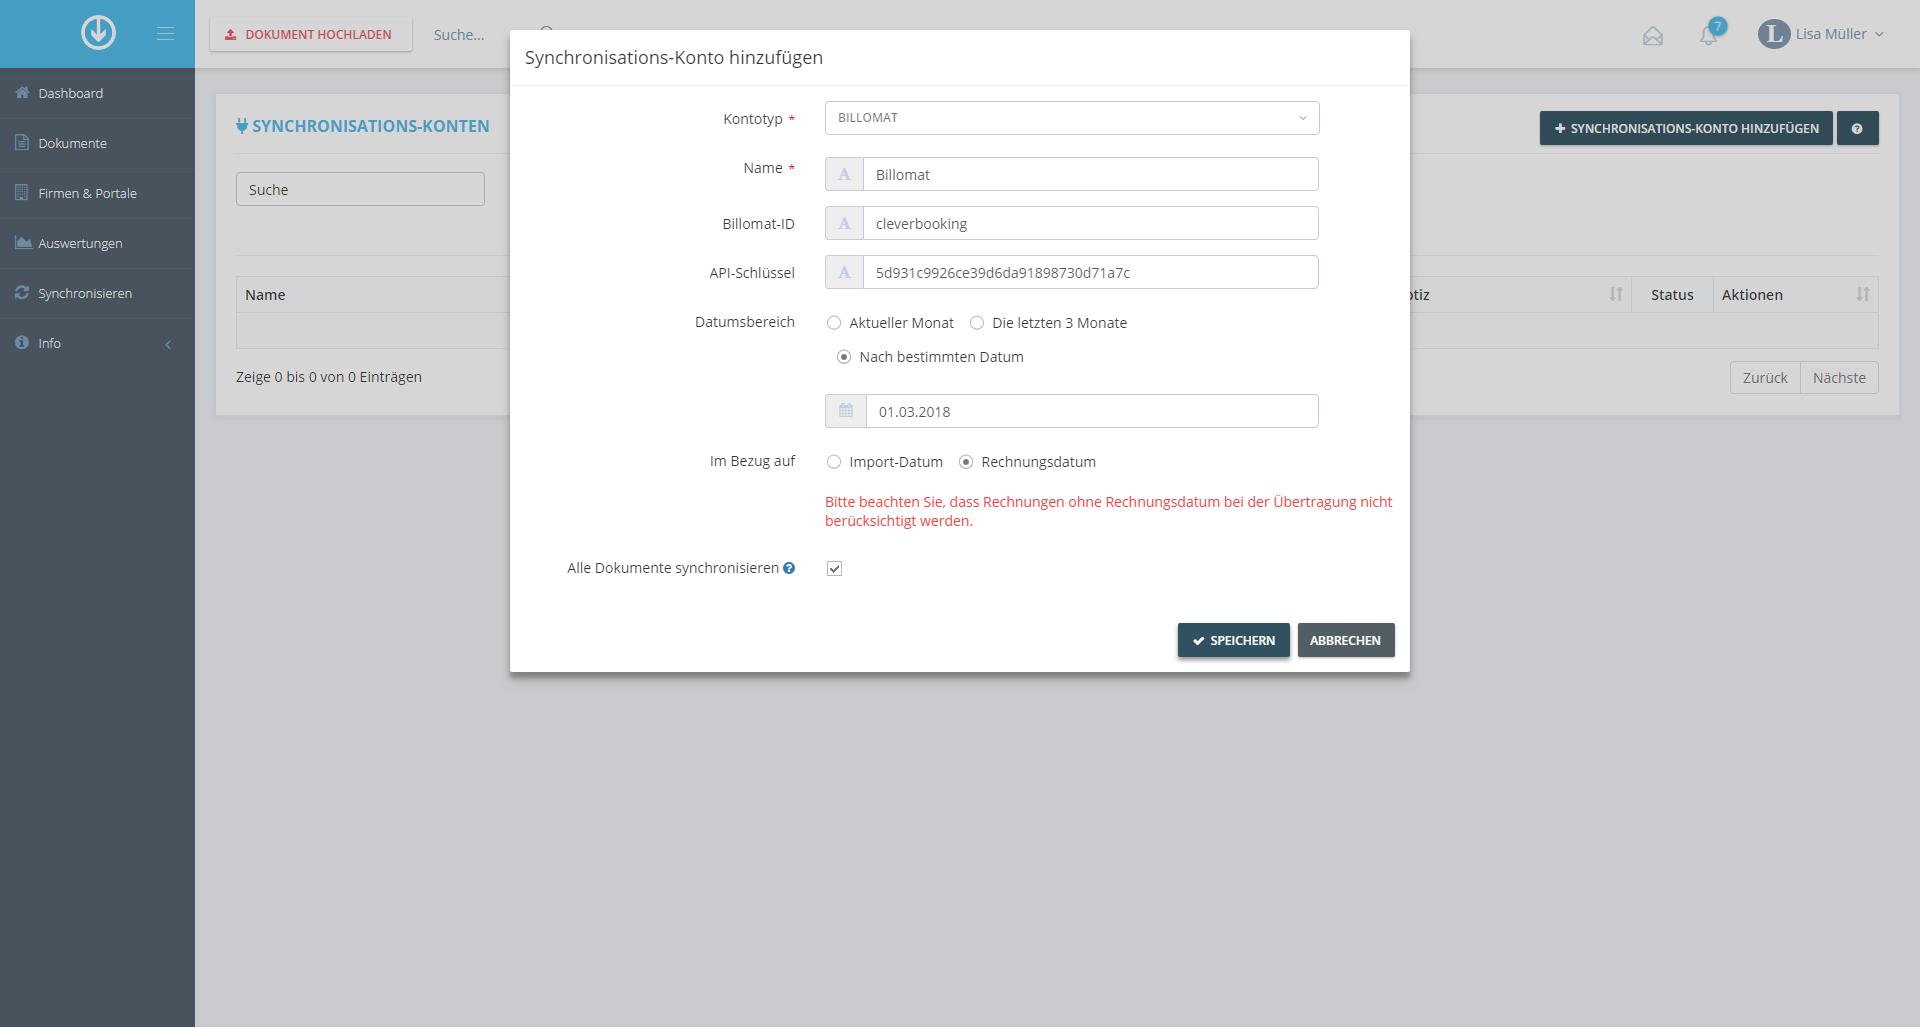 3. Dokumentenexport: Synchronisations-Konto hinzufügen